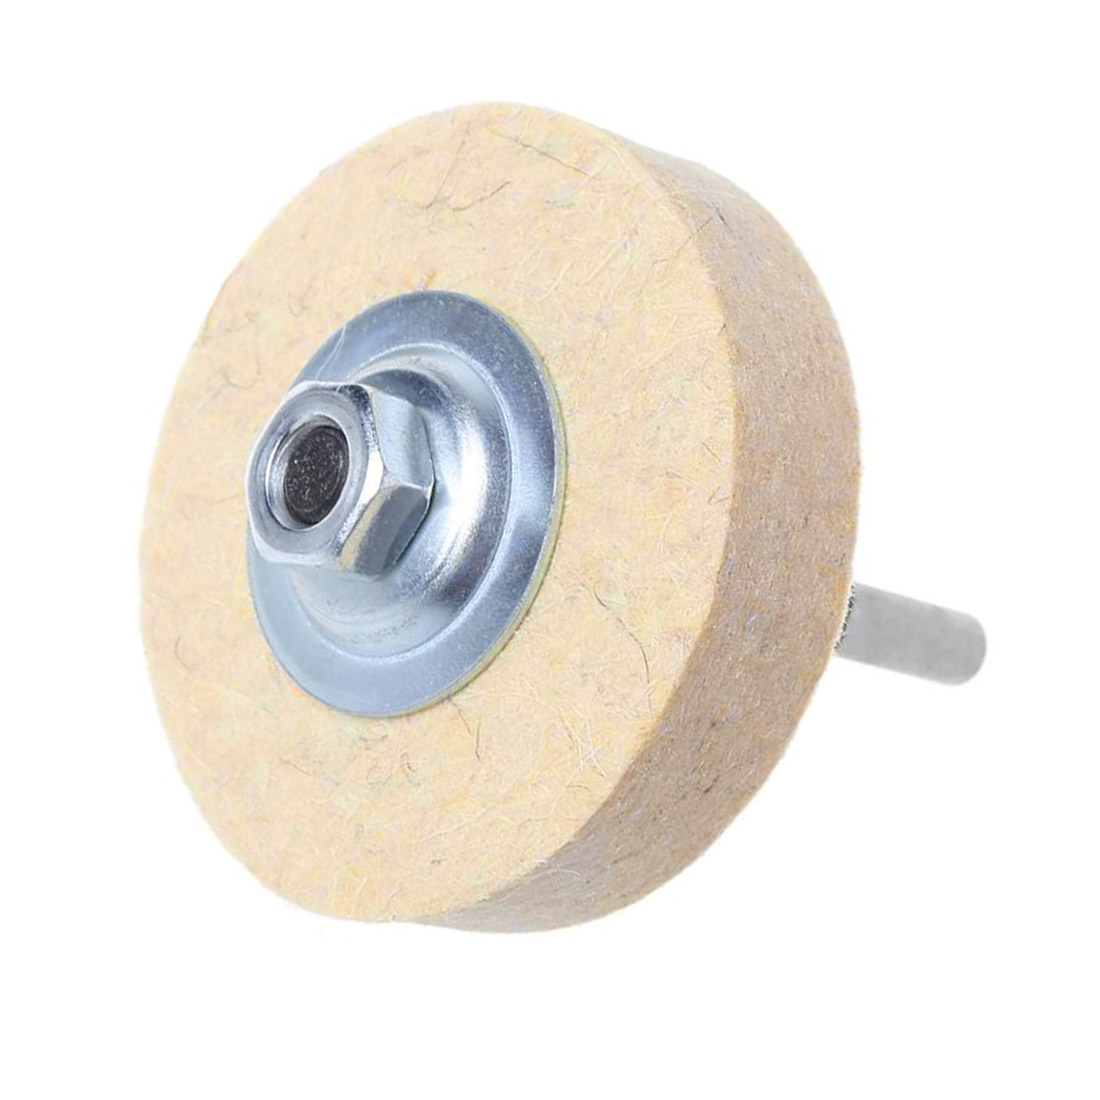 100pcs Wool Felt Polishing Buffing Round Wheel Tool 2 Shank For Rotary FP